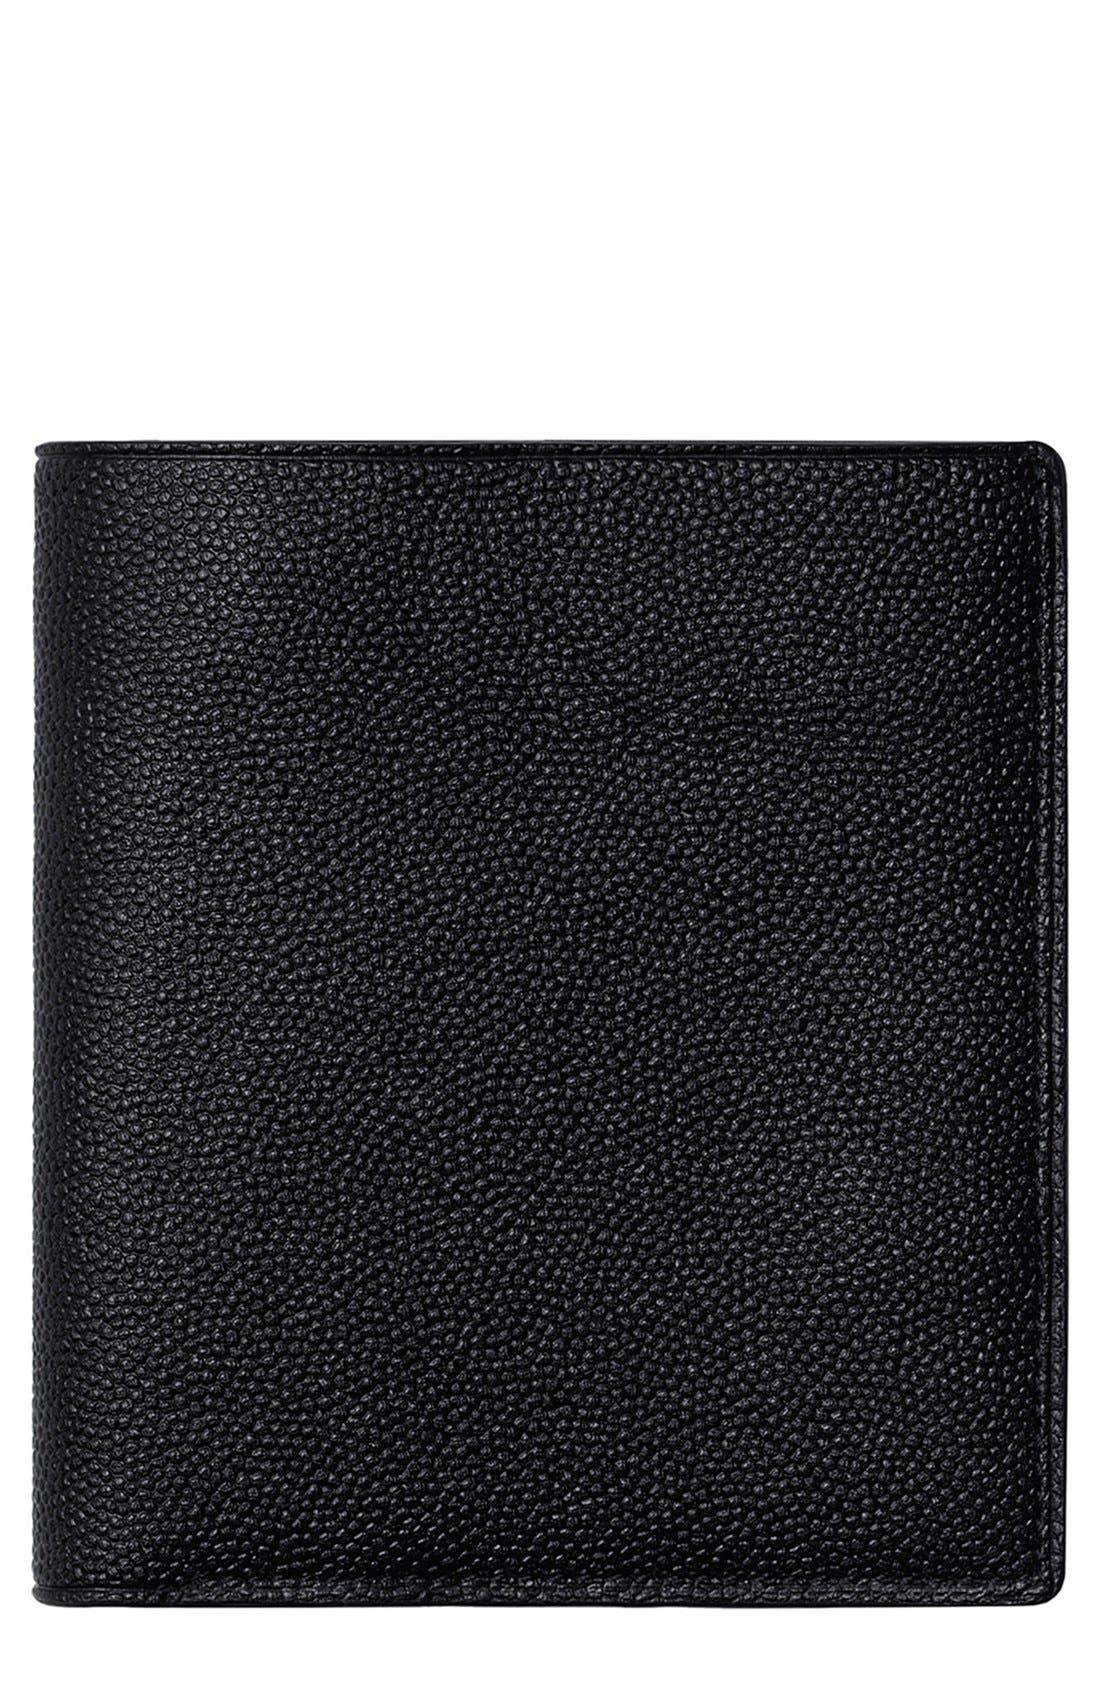 de la Vie 'Bradley' Bifold Wallet,                             Main thumbnail 1, color,                             Black Caviar